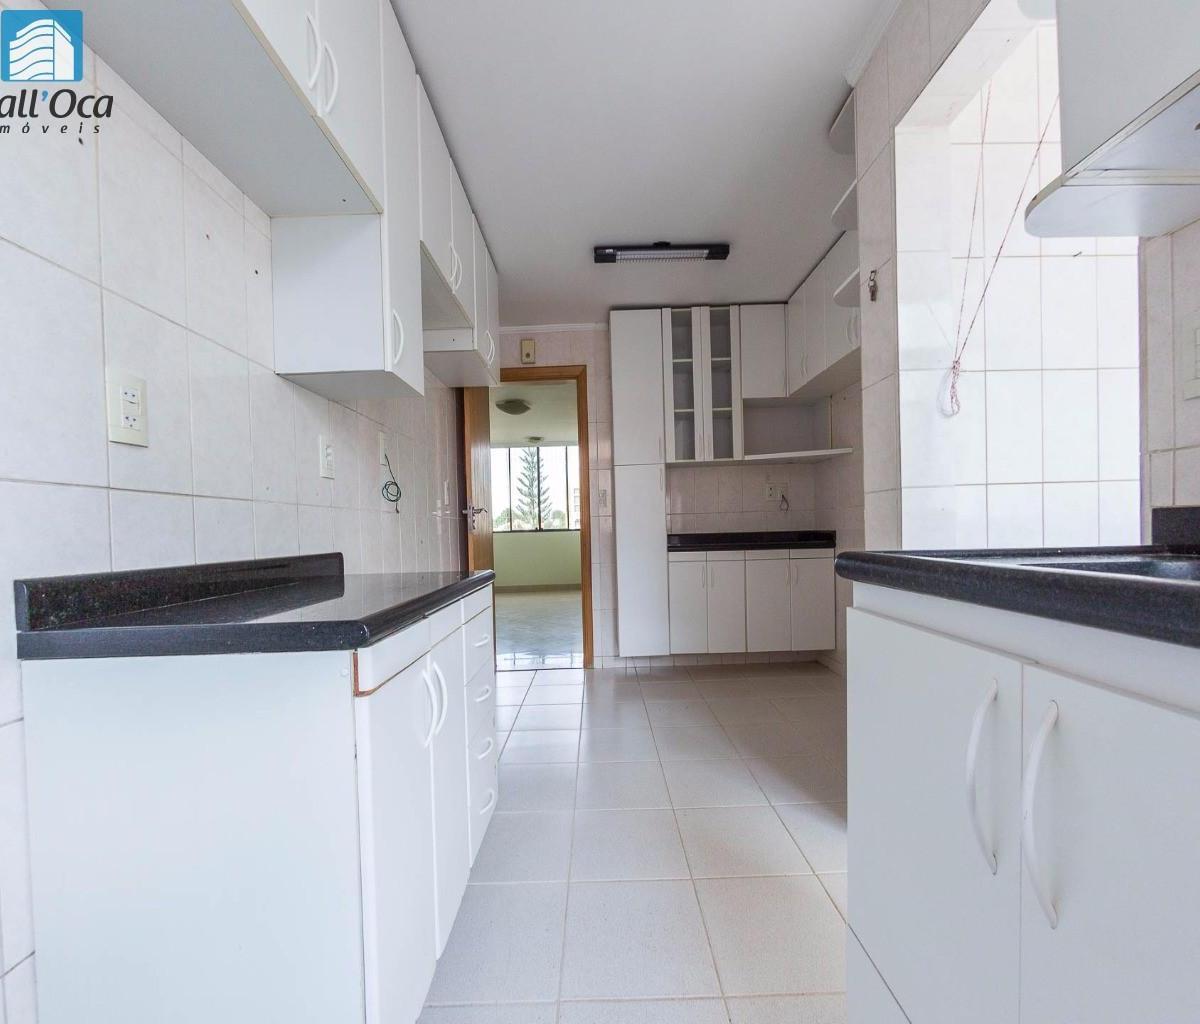 Imagens de #5F4E42  Aluguel Distrito Federal Brasília Asa Norte SQN 313 BLOCO L  VAZADO 1200x1024 px 3560 Blindex Banheiro Asa Norte